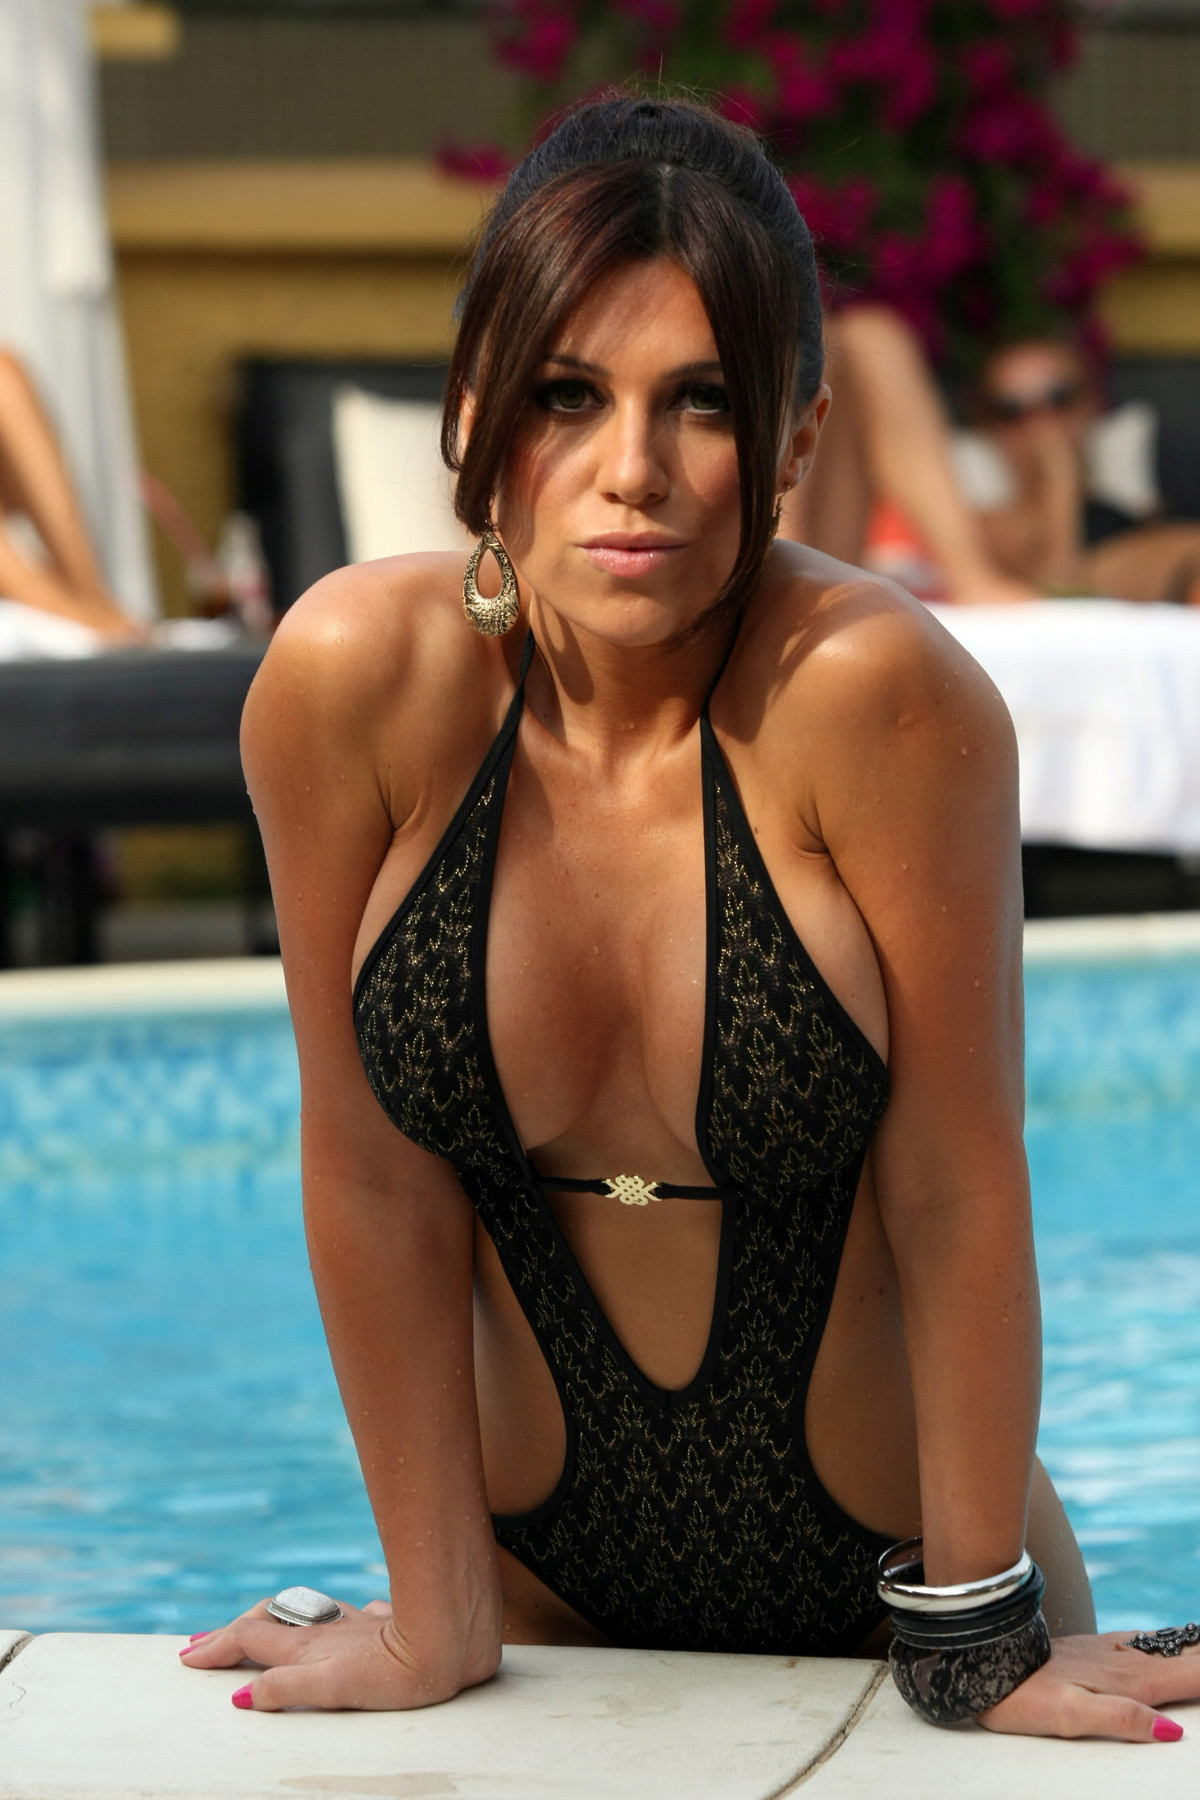 Bikini Stanija Dobrojevic naked (33 photo), Tits, Bikini, Feet, swimsuit 2015